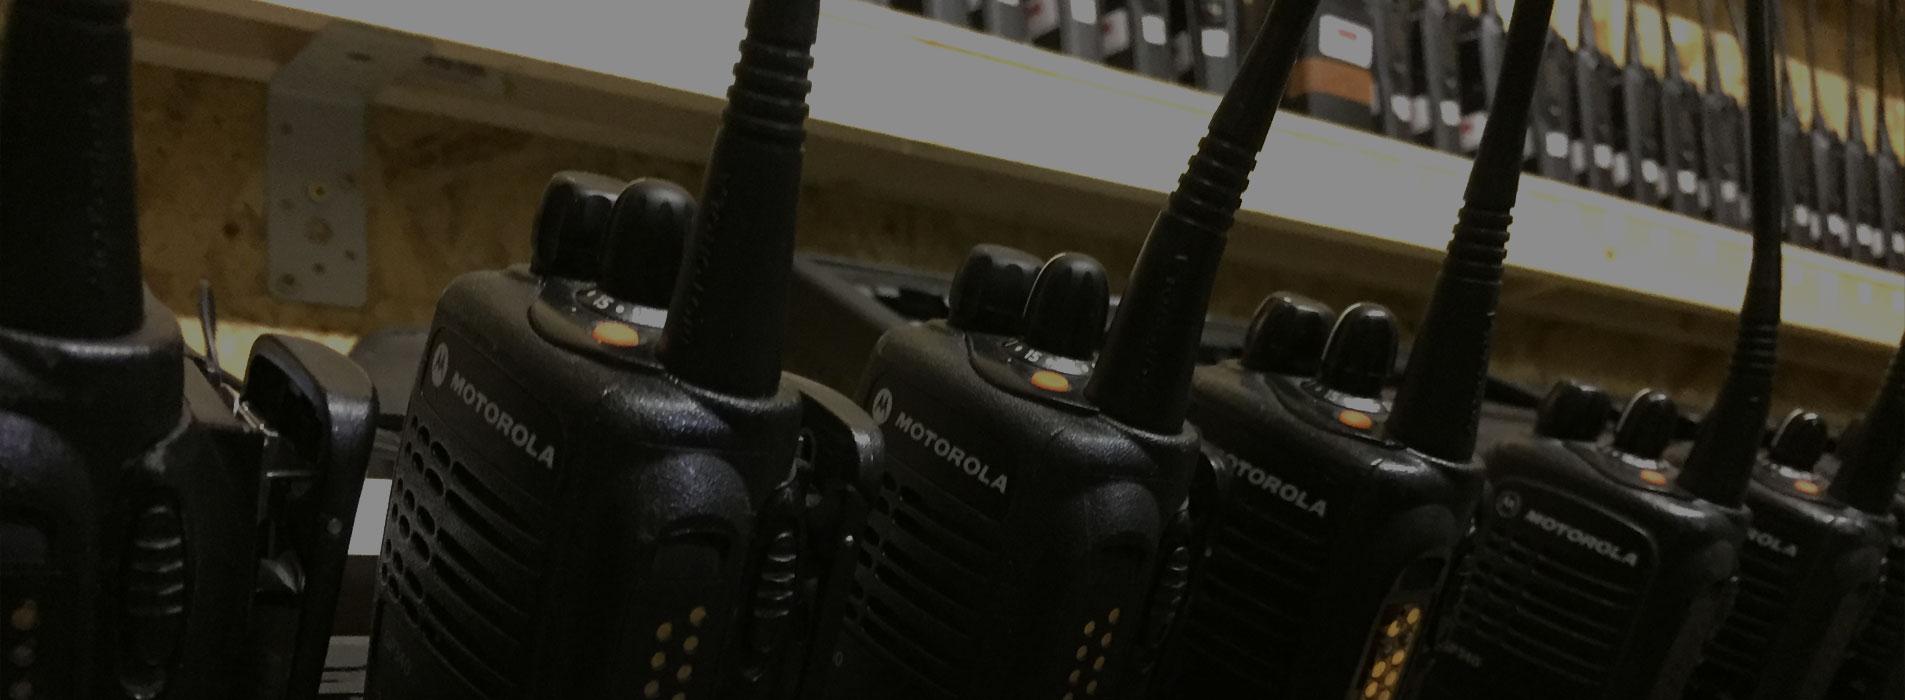 walkie talkies photo